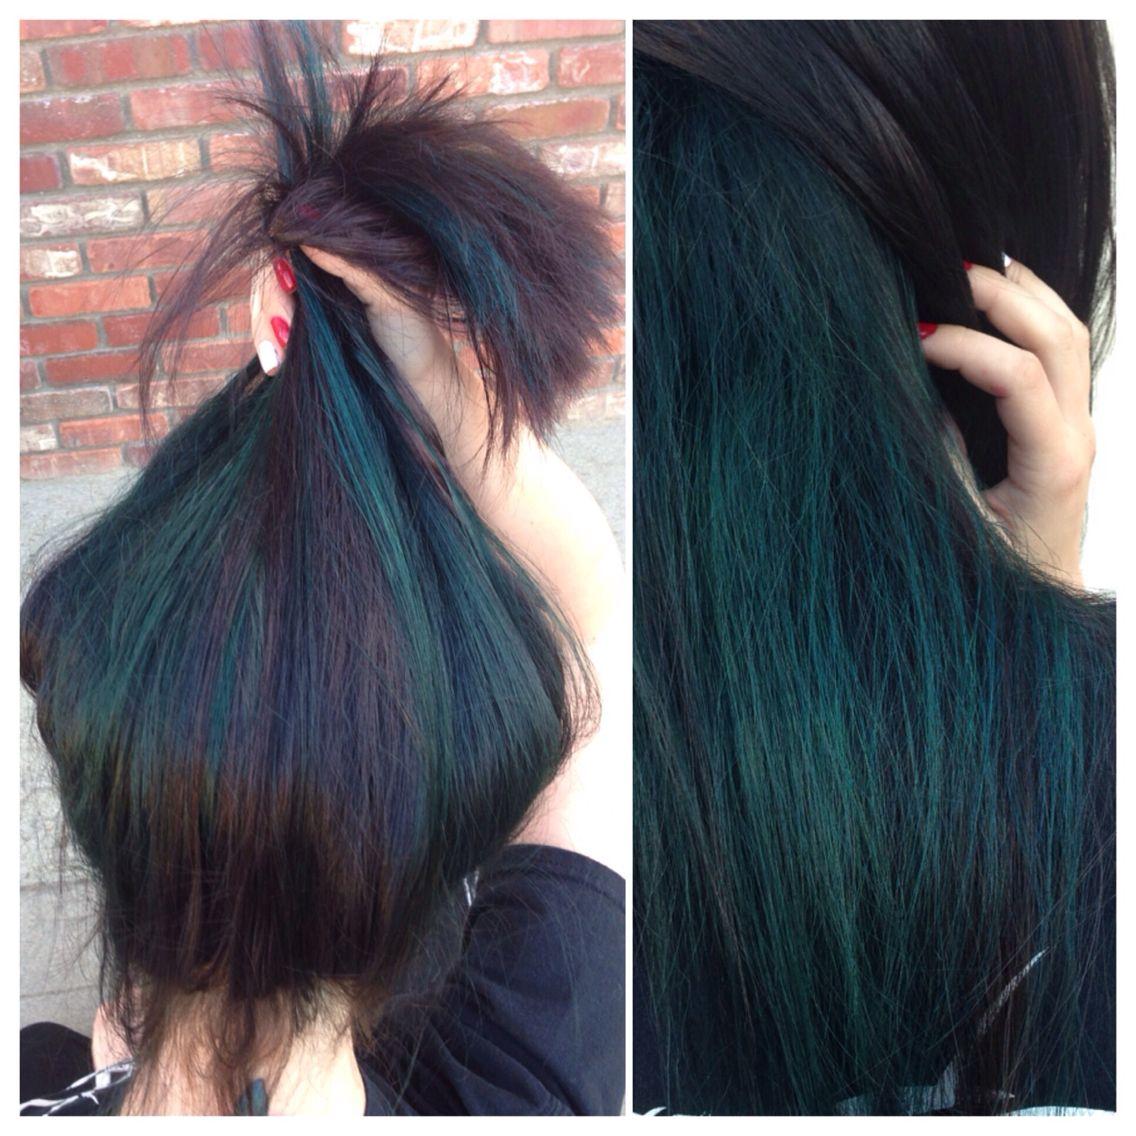 Dark Brown With Teal Underneath Hair Highlights Hair Dark Teal Hair